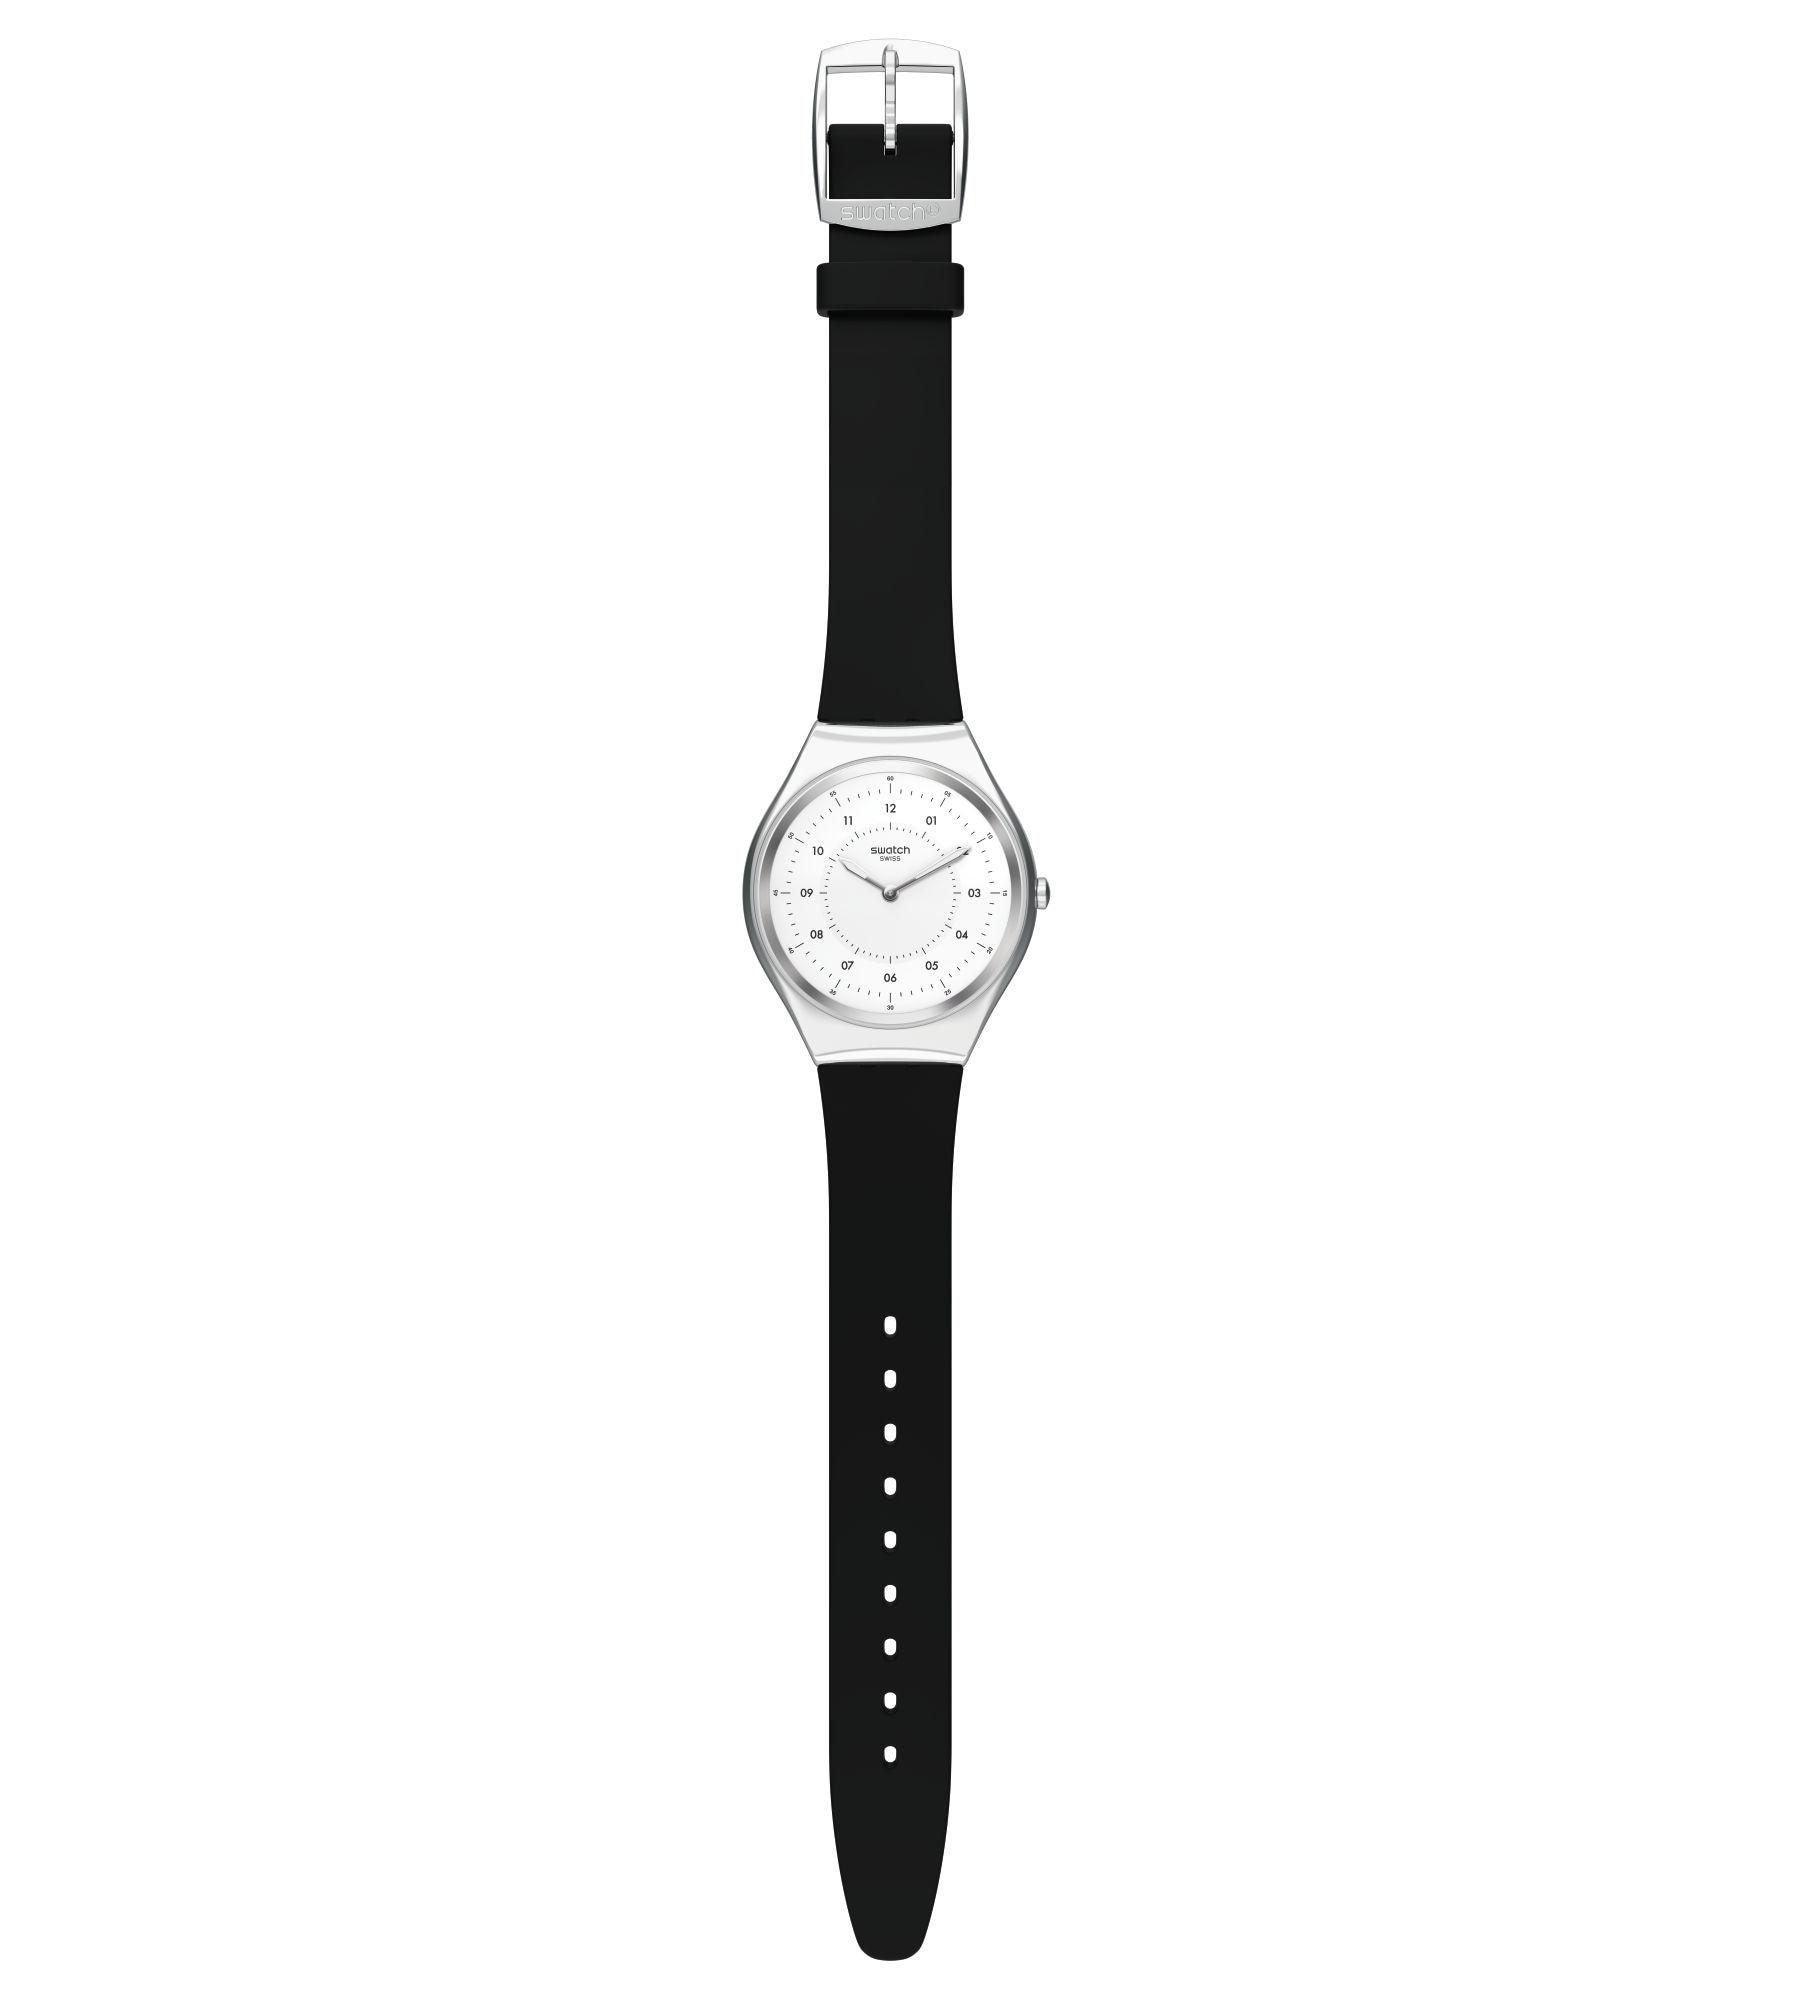 nuevo producto a874c e1ca7 Swatch® España - Irony (Ø 38 MM) SKINNOIRIRON SYXS100